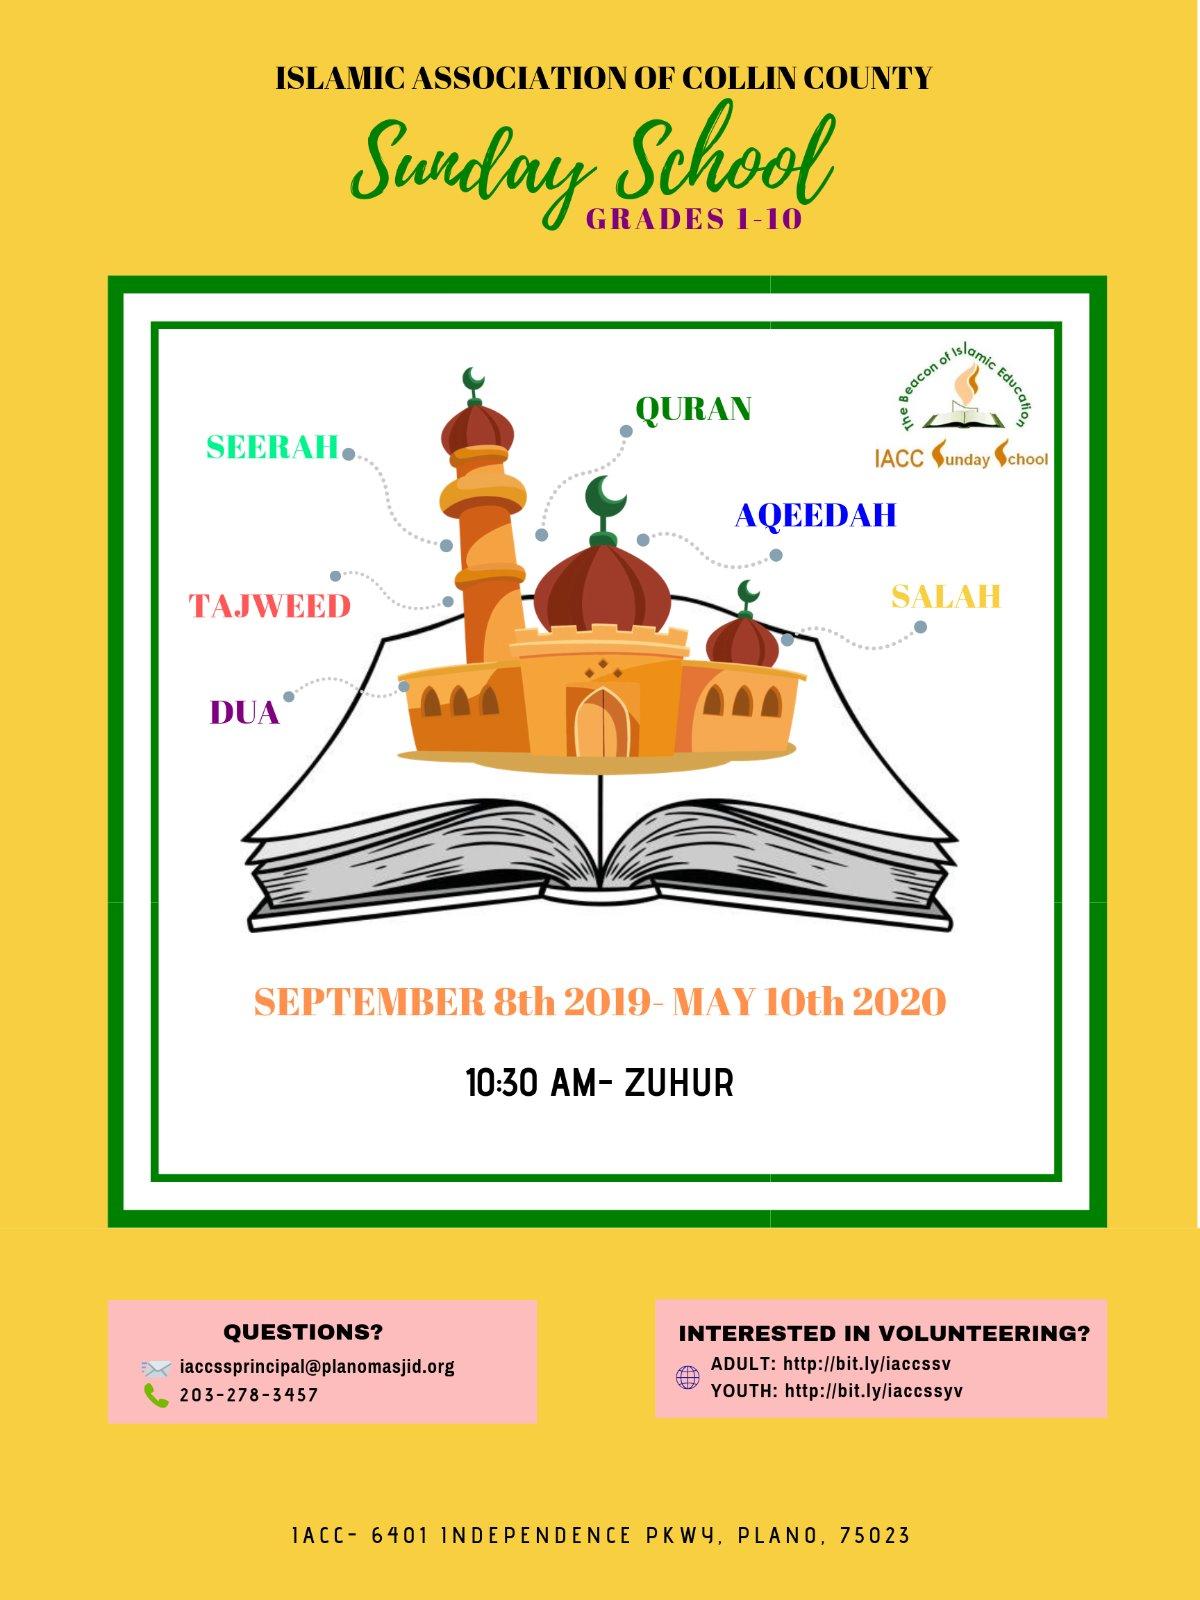 Plano Masjid | Islamic Association of Collin County